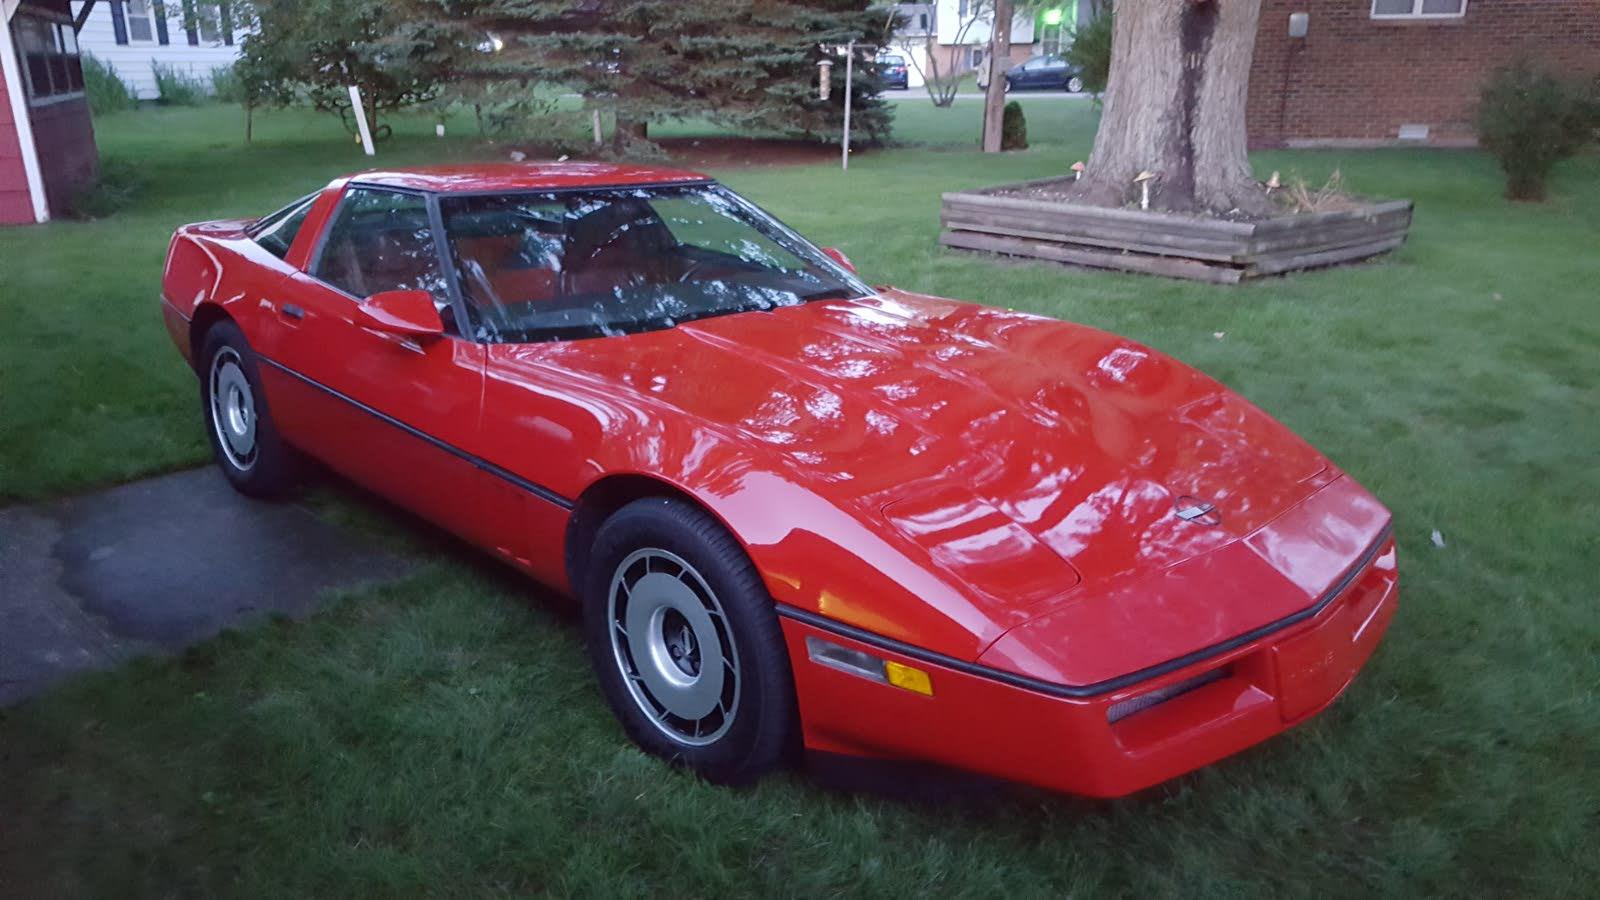 Kelebihan Kekurangan Corvette 1984 Review